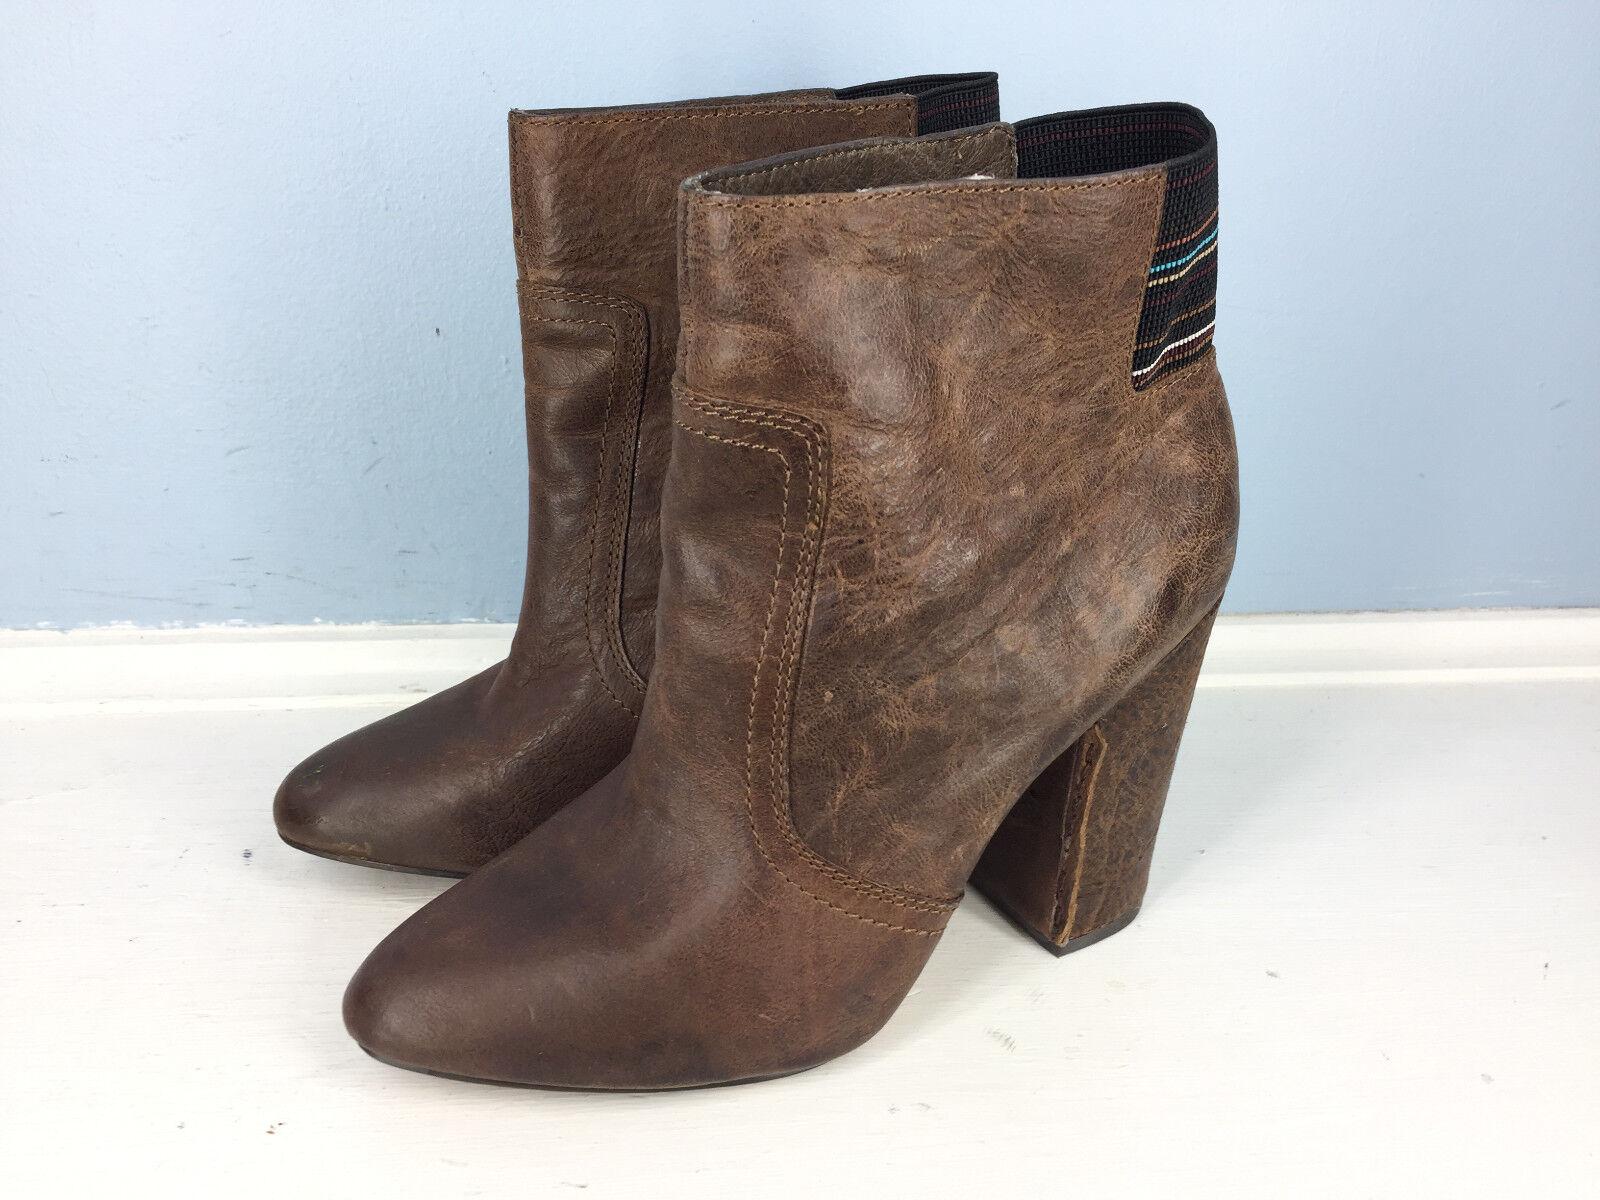 Joe's Jeans Braun Leder Pull On Ankle boot High Heel 6.5 Anthropologie EUC